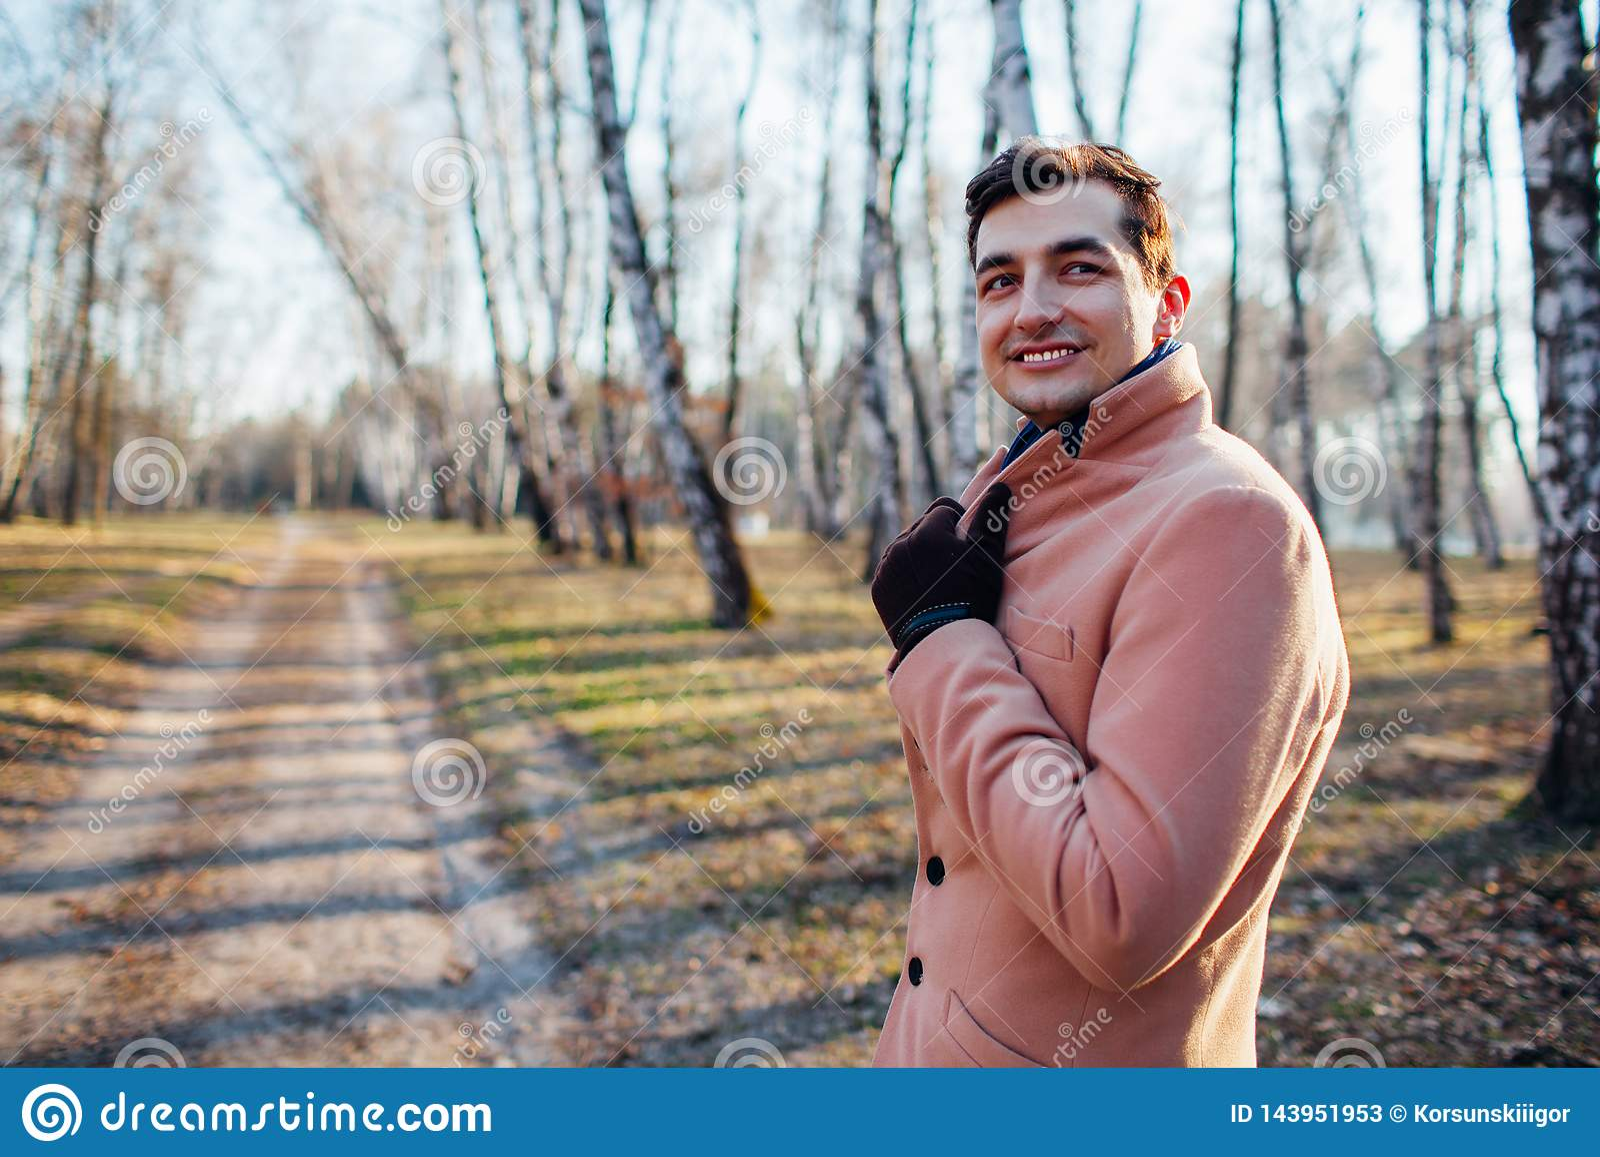 Молодой мужчина идя в лес в природе в пальто сливк